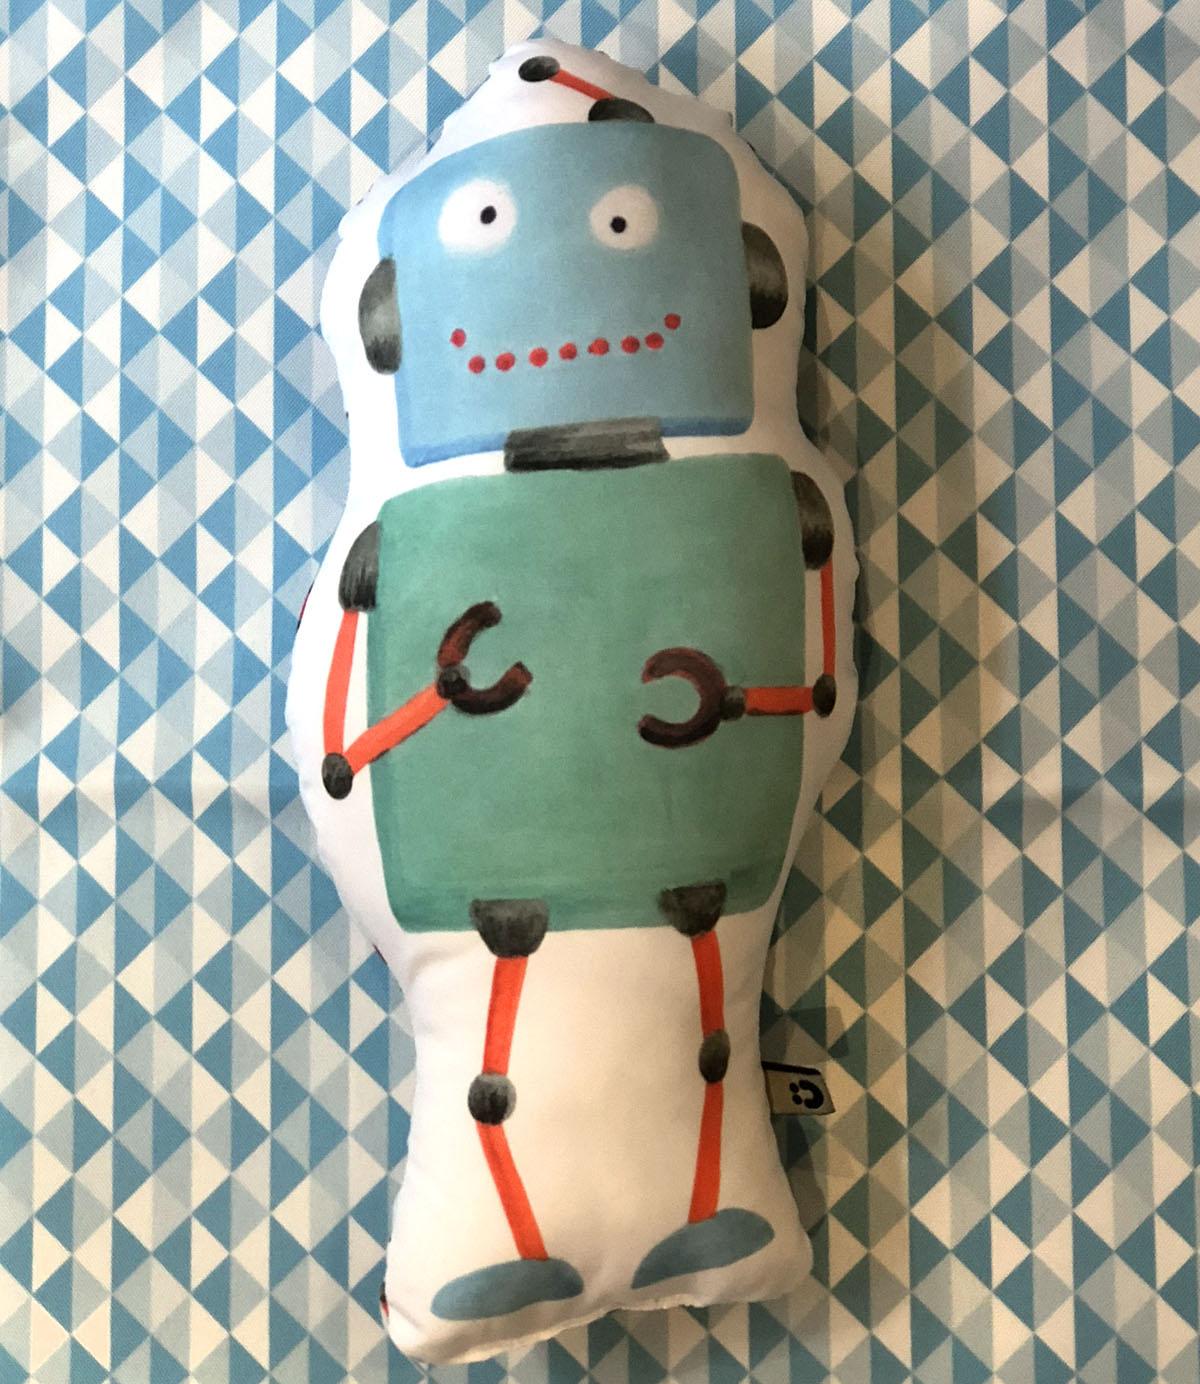 Almofada Toy Robô 1